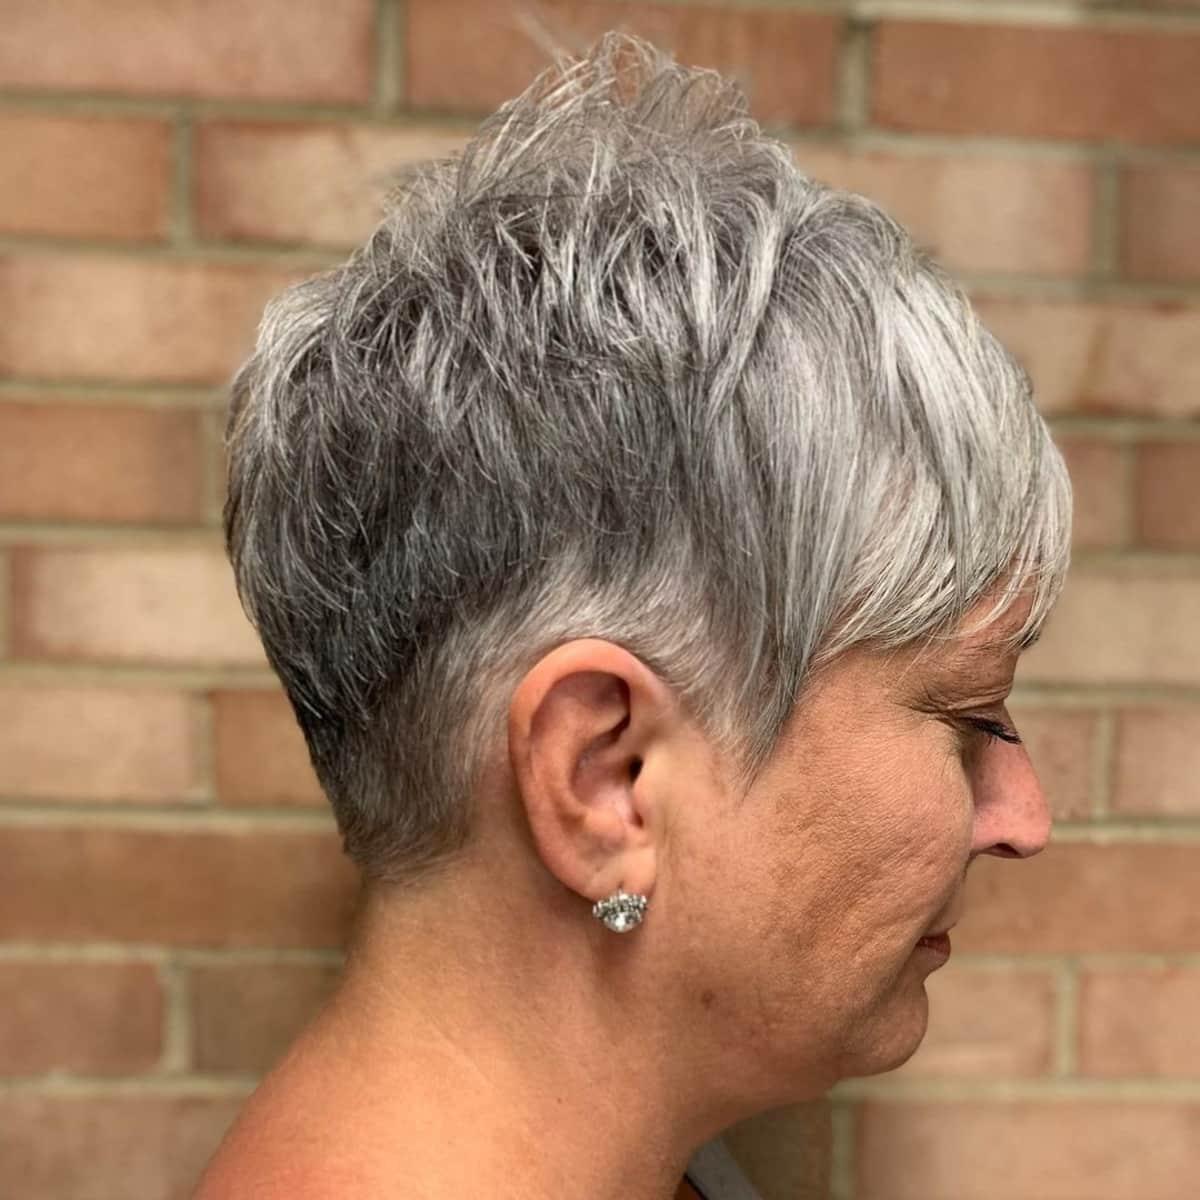 Pixie gris para mujeres mayores